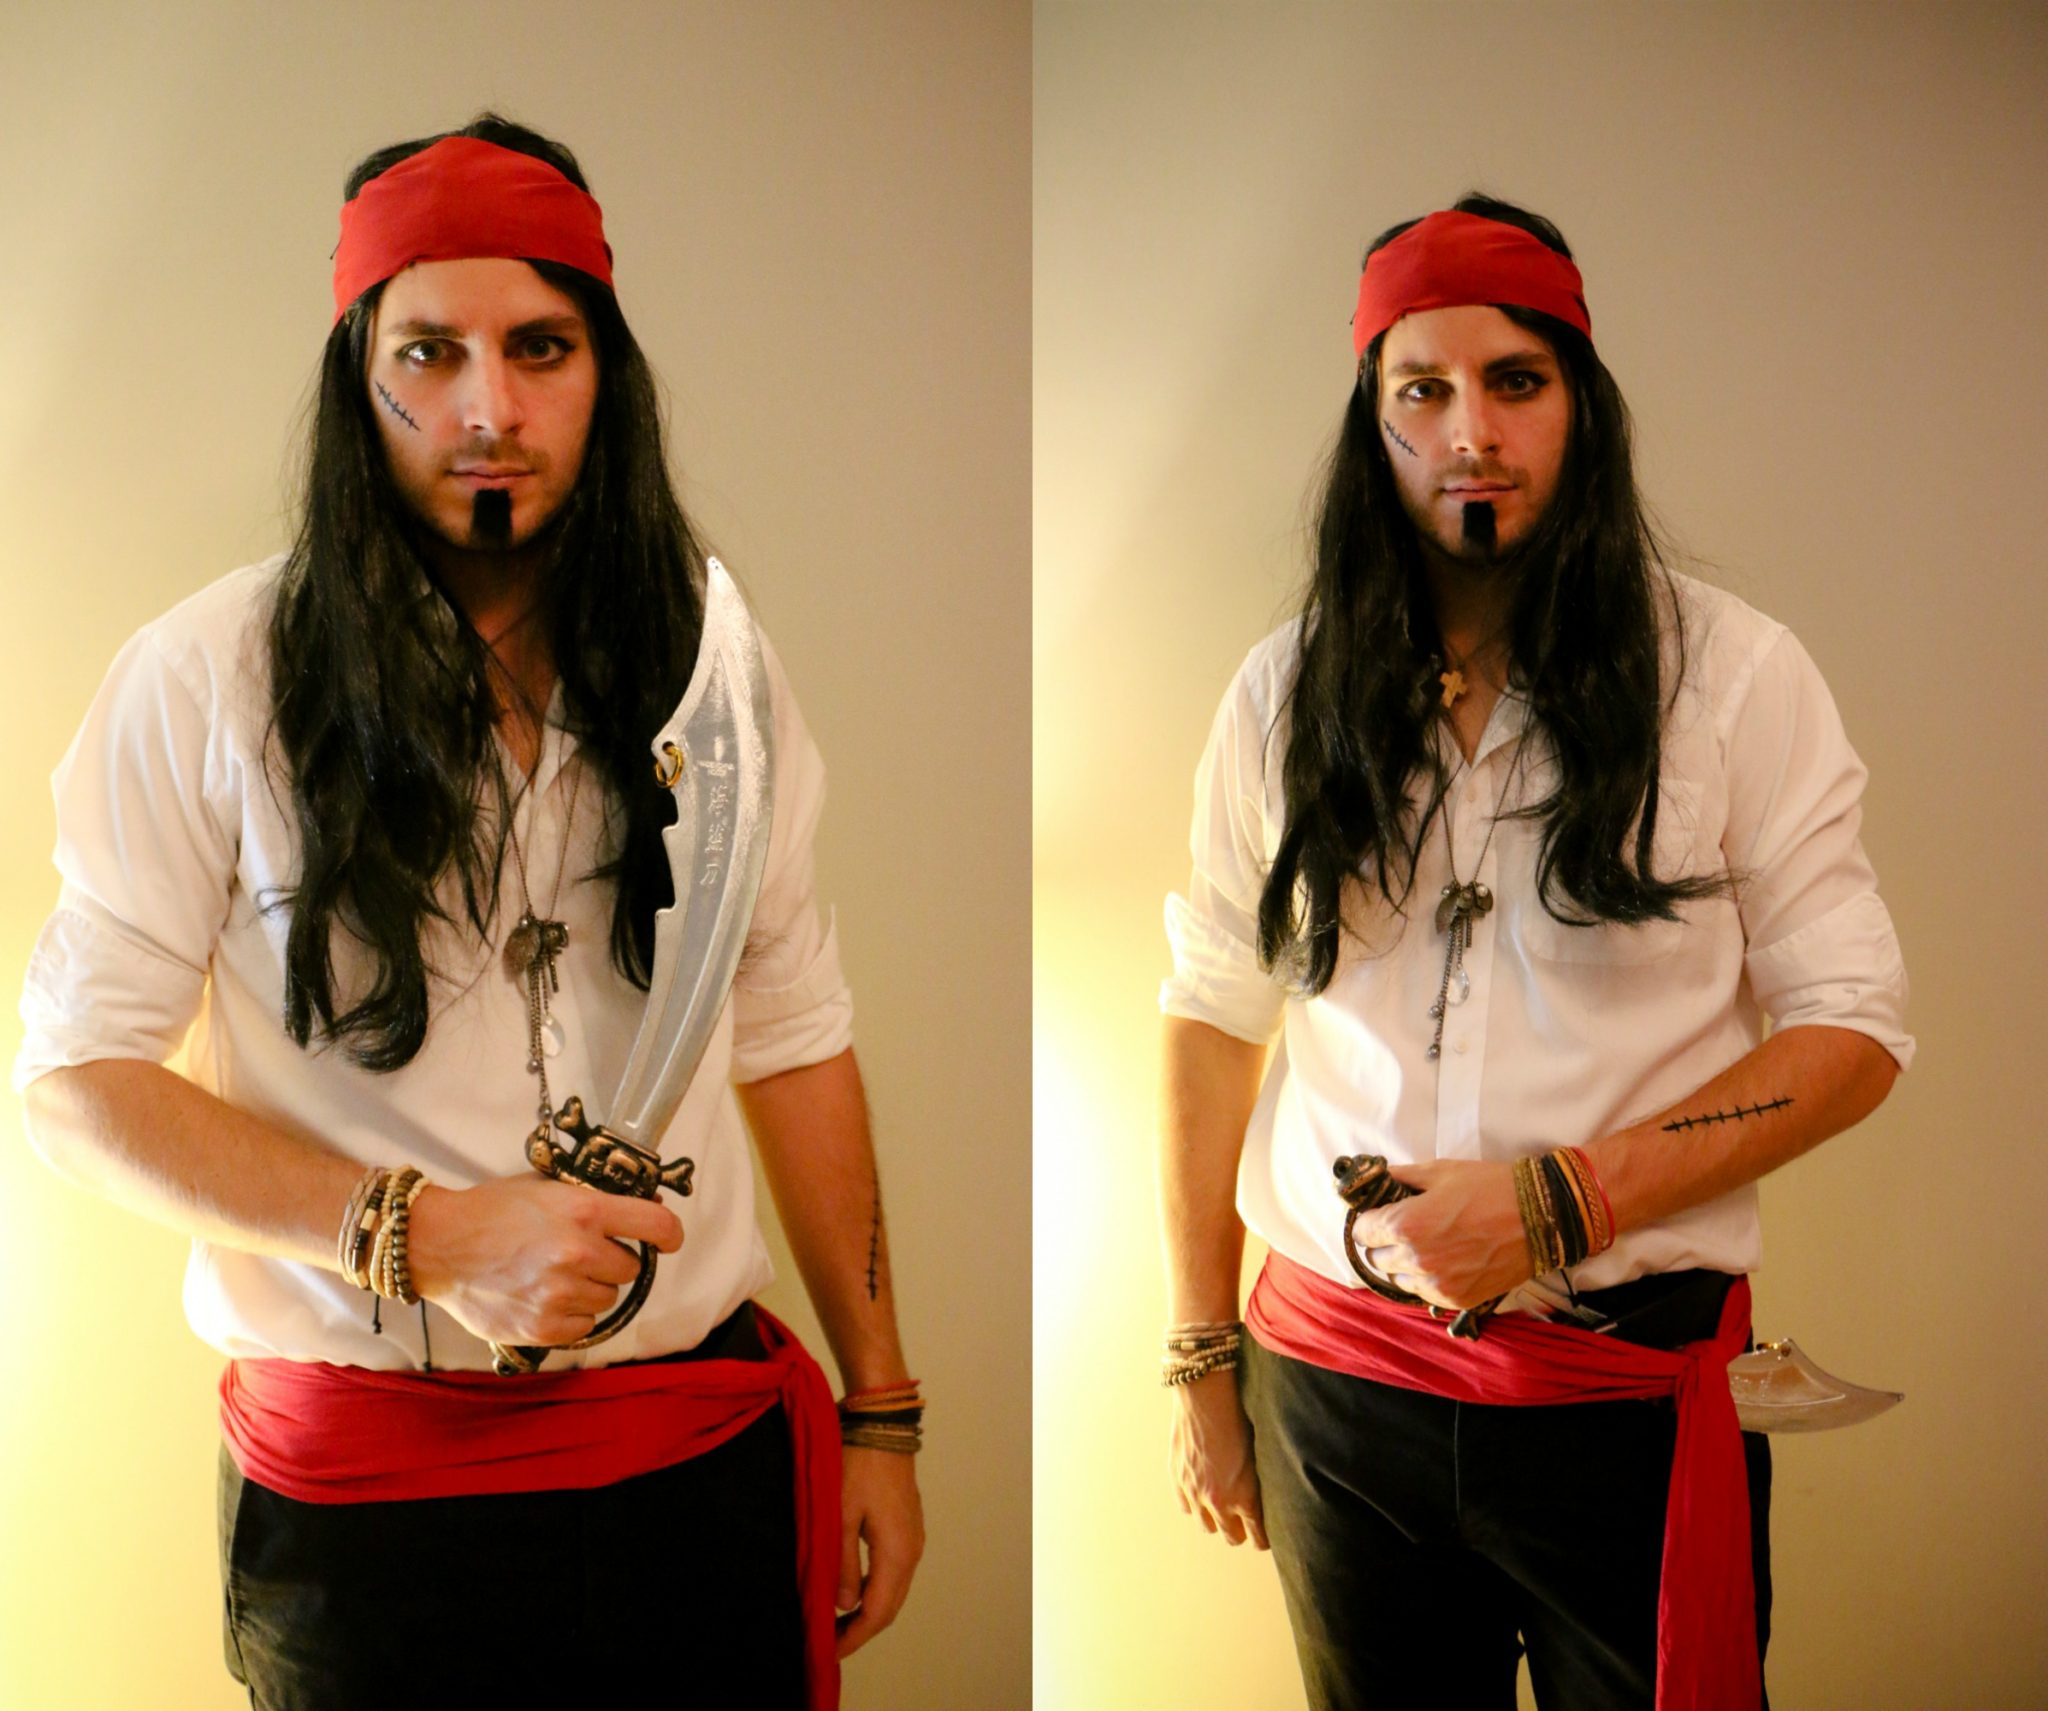 justin pirate